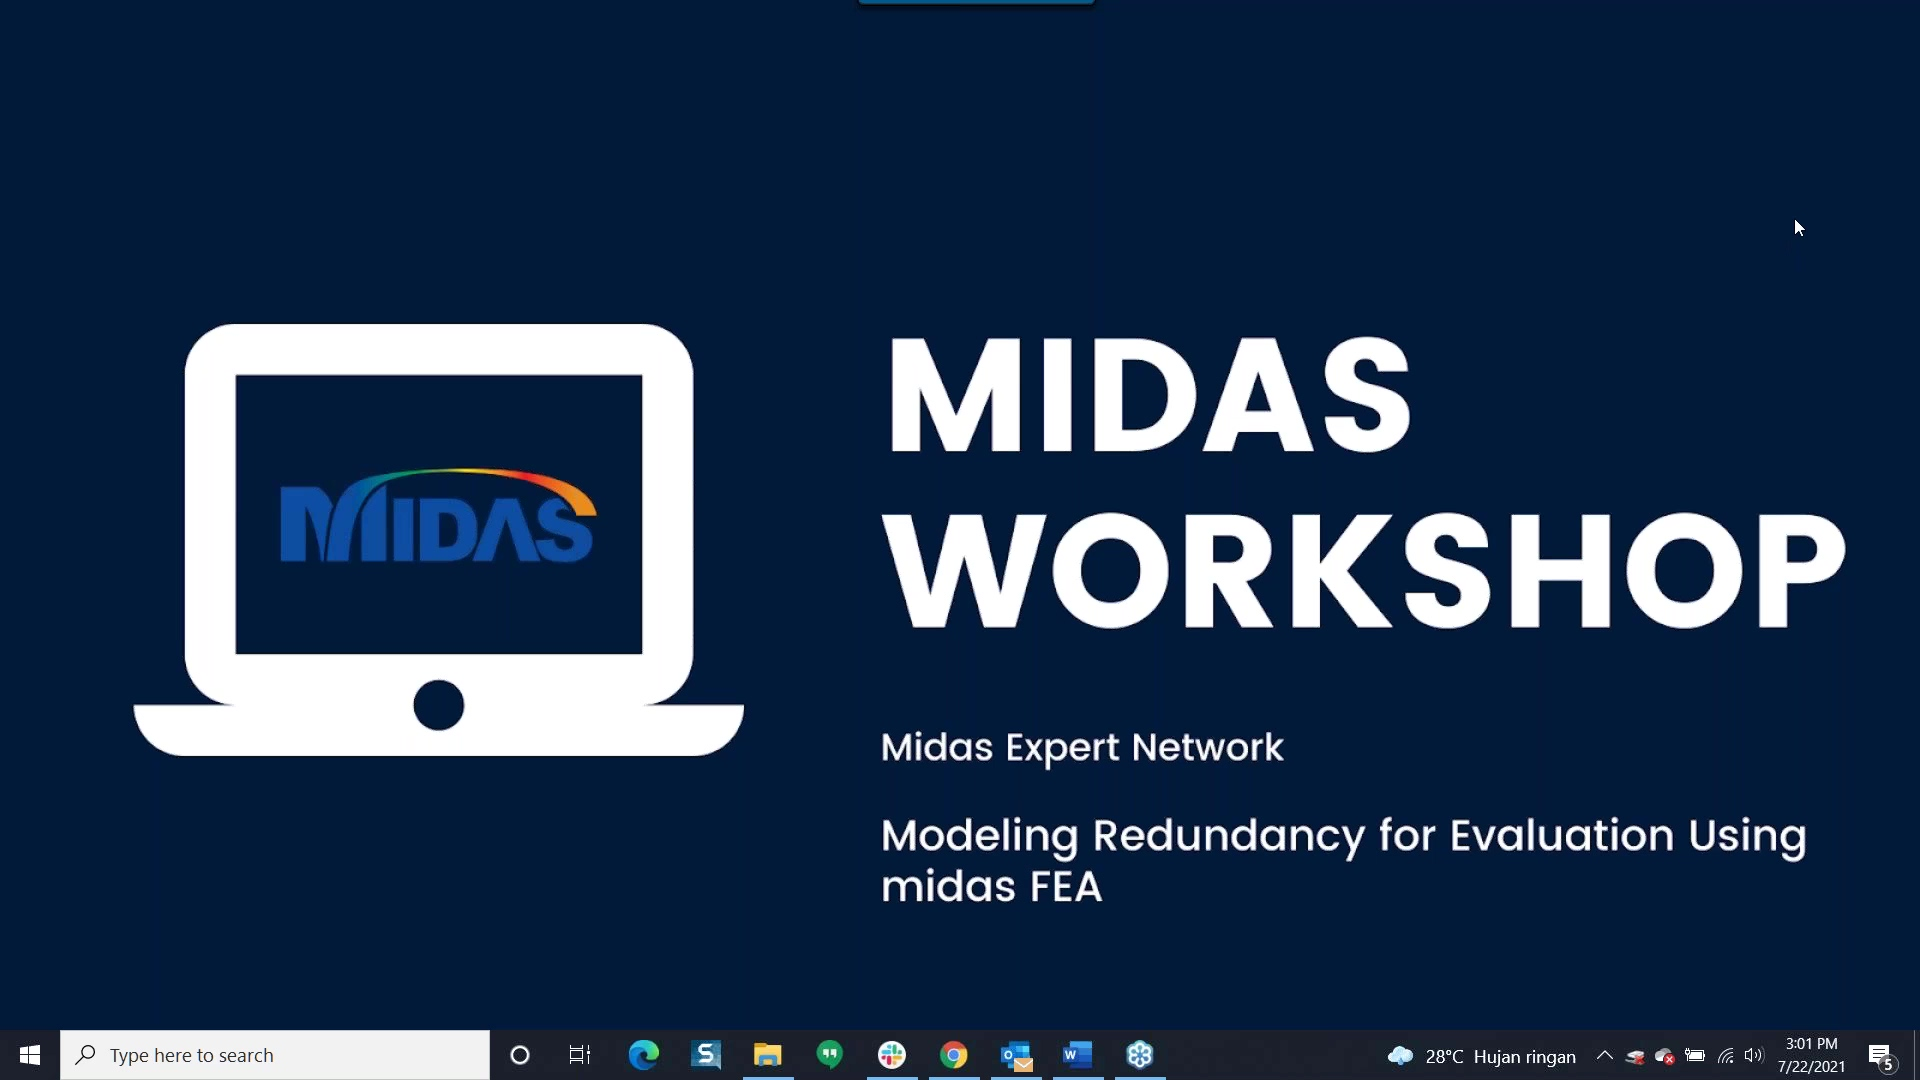 MIDAS Expert Workshop_ Modeling Redundancy for Evaluation using midas FEA